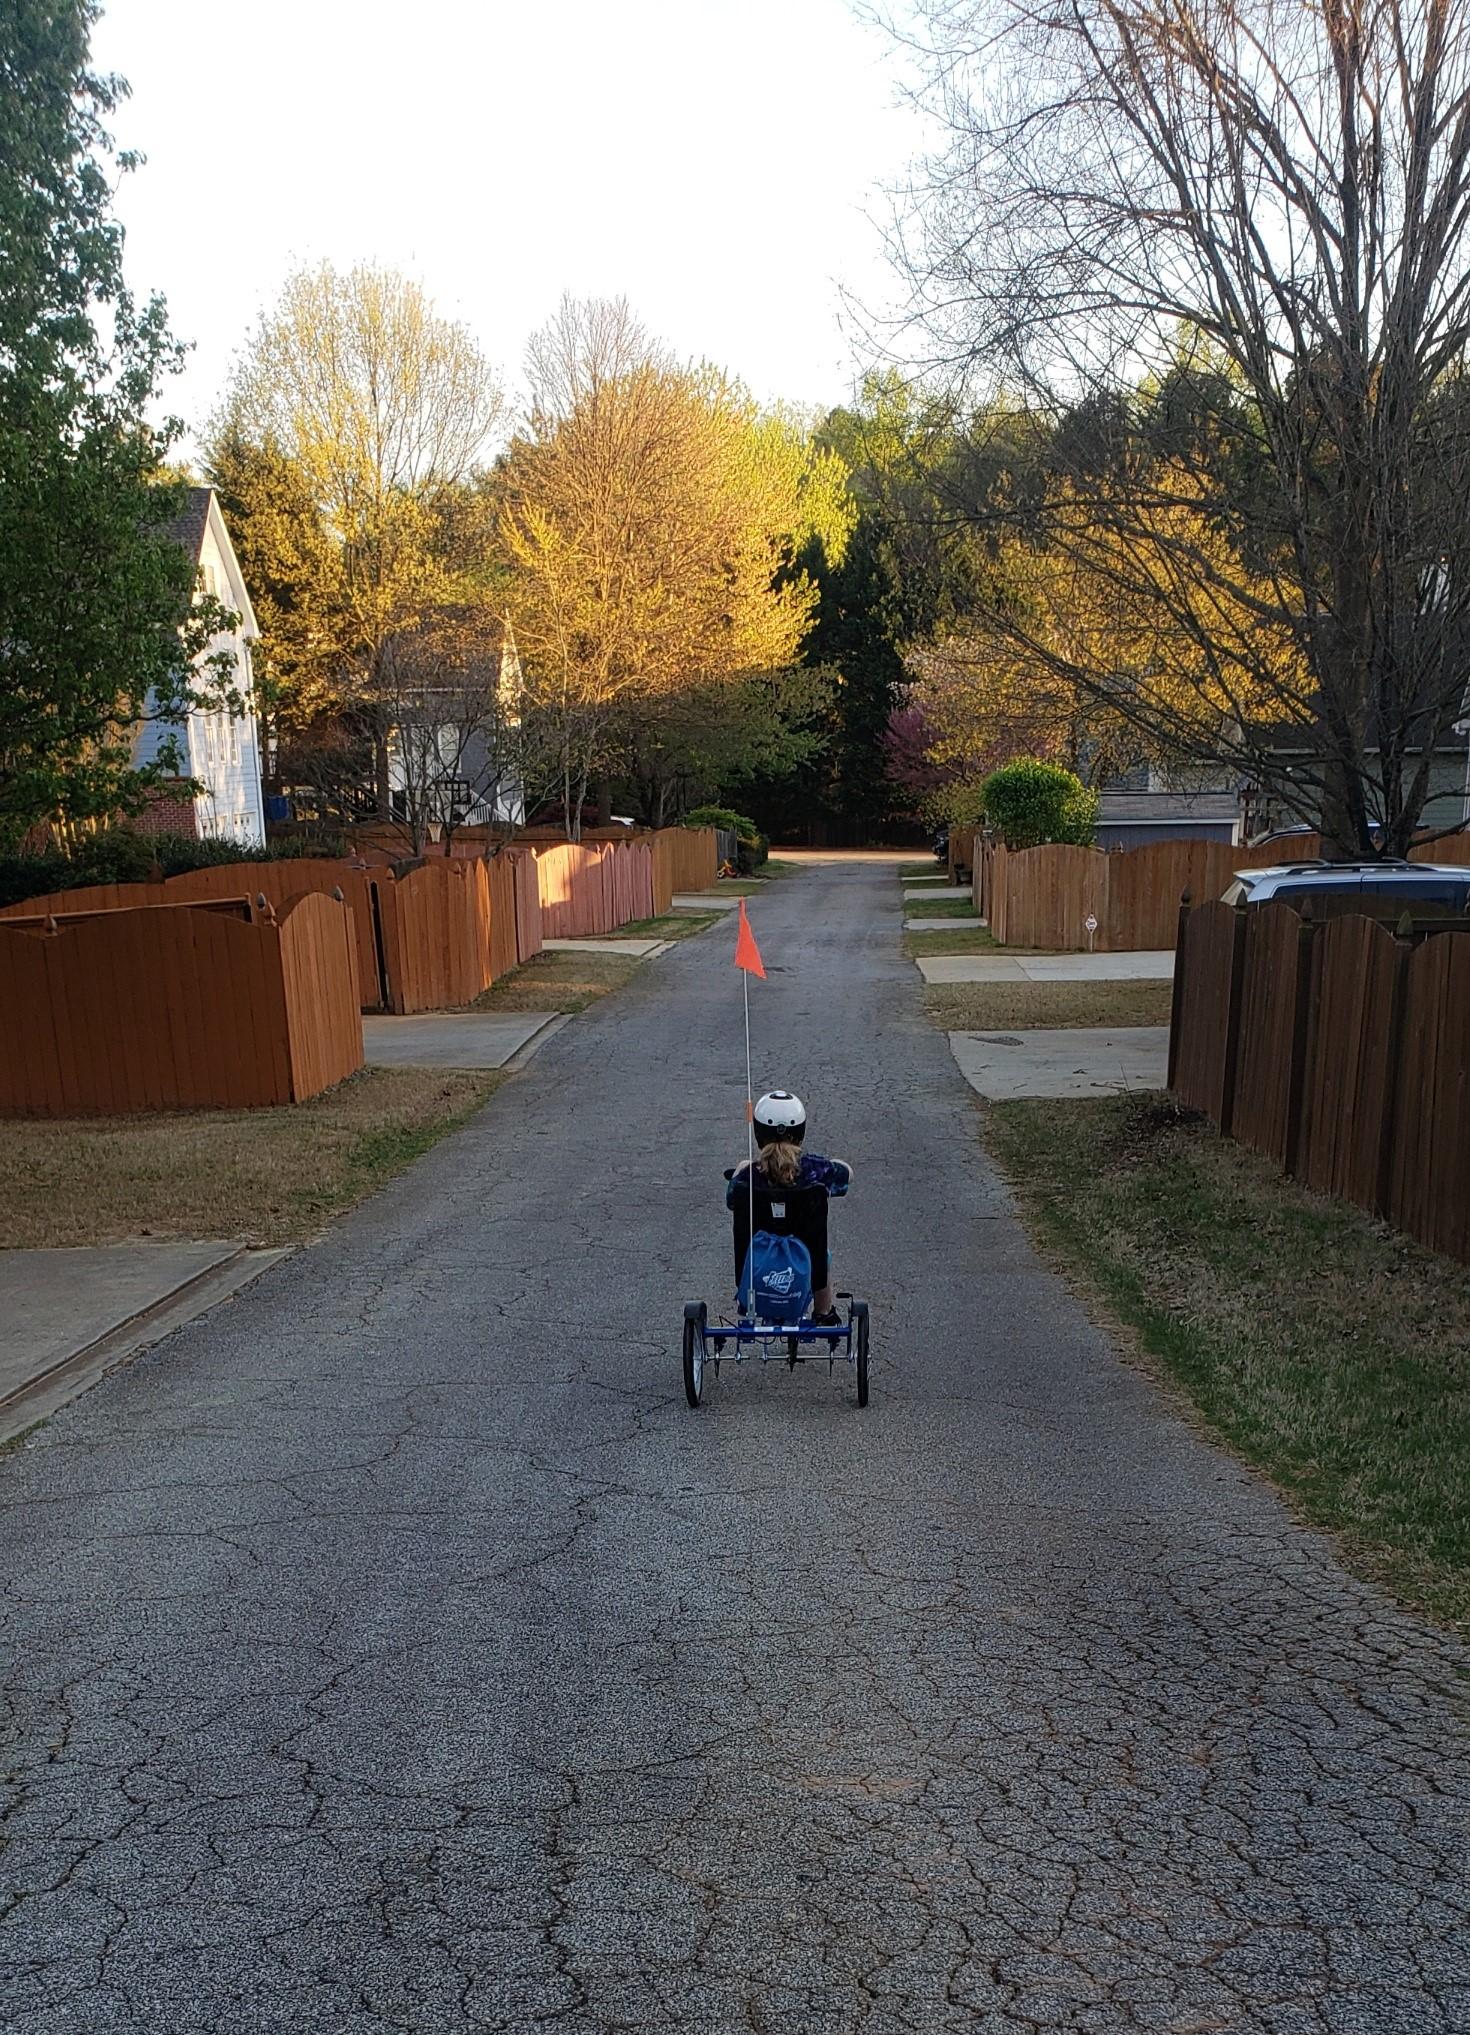 Ayden riding his adaptive bike away from the camera.